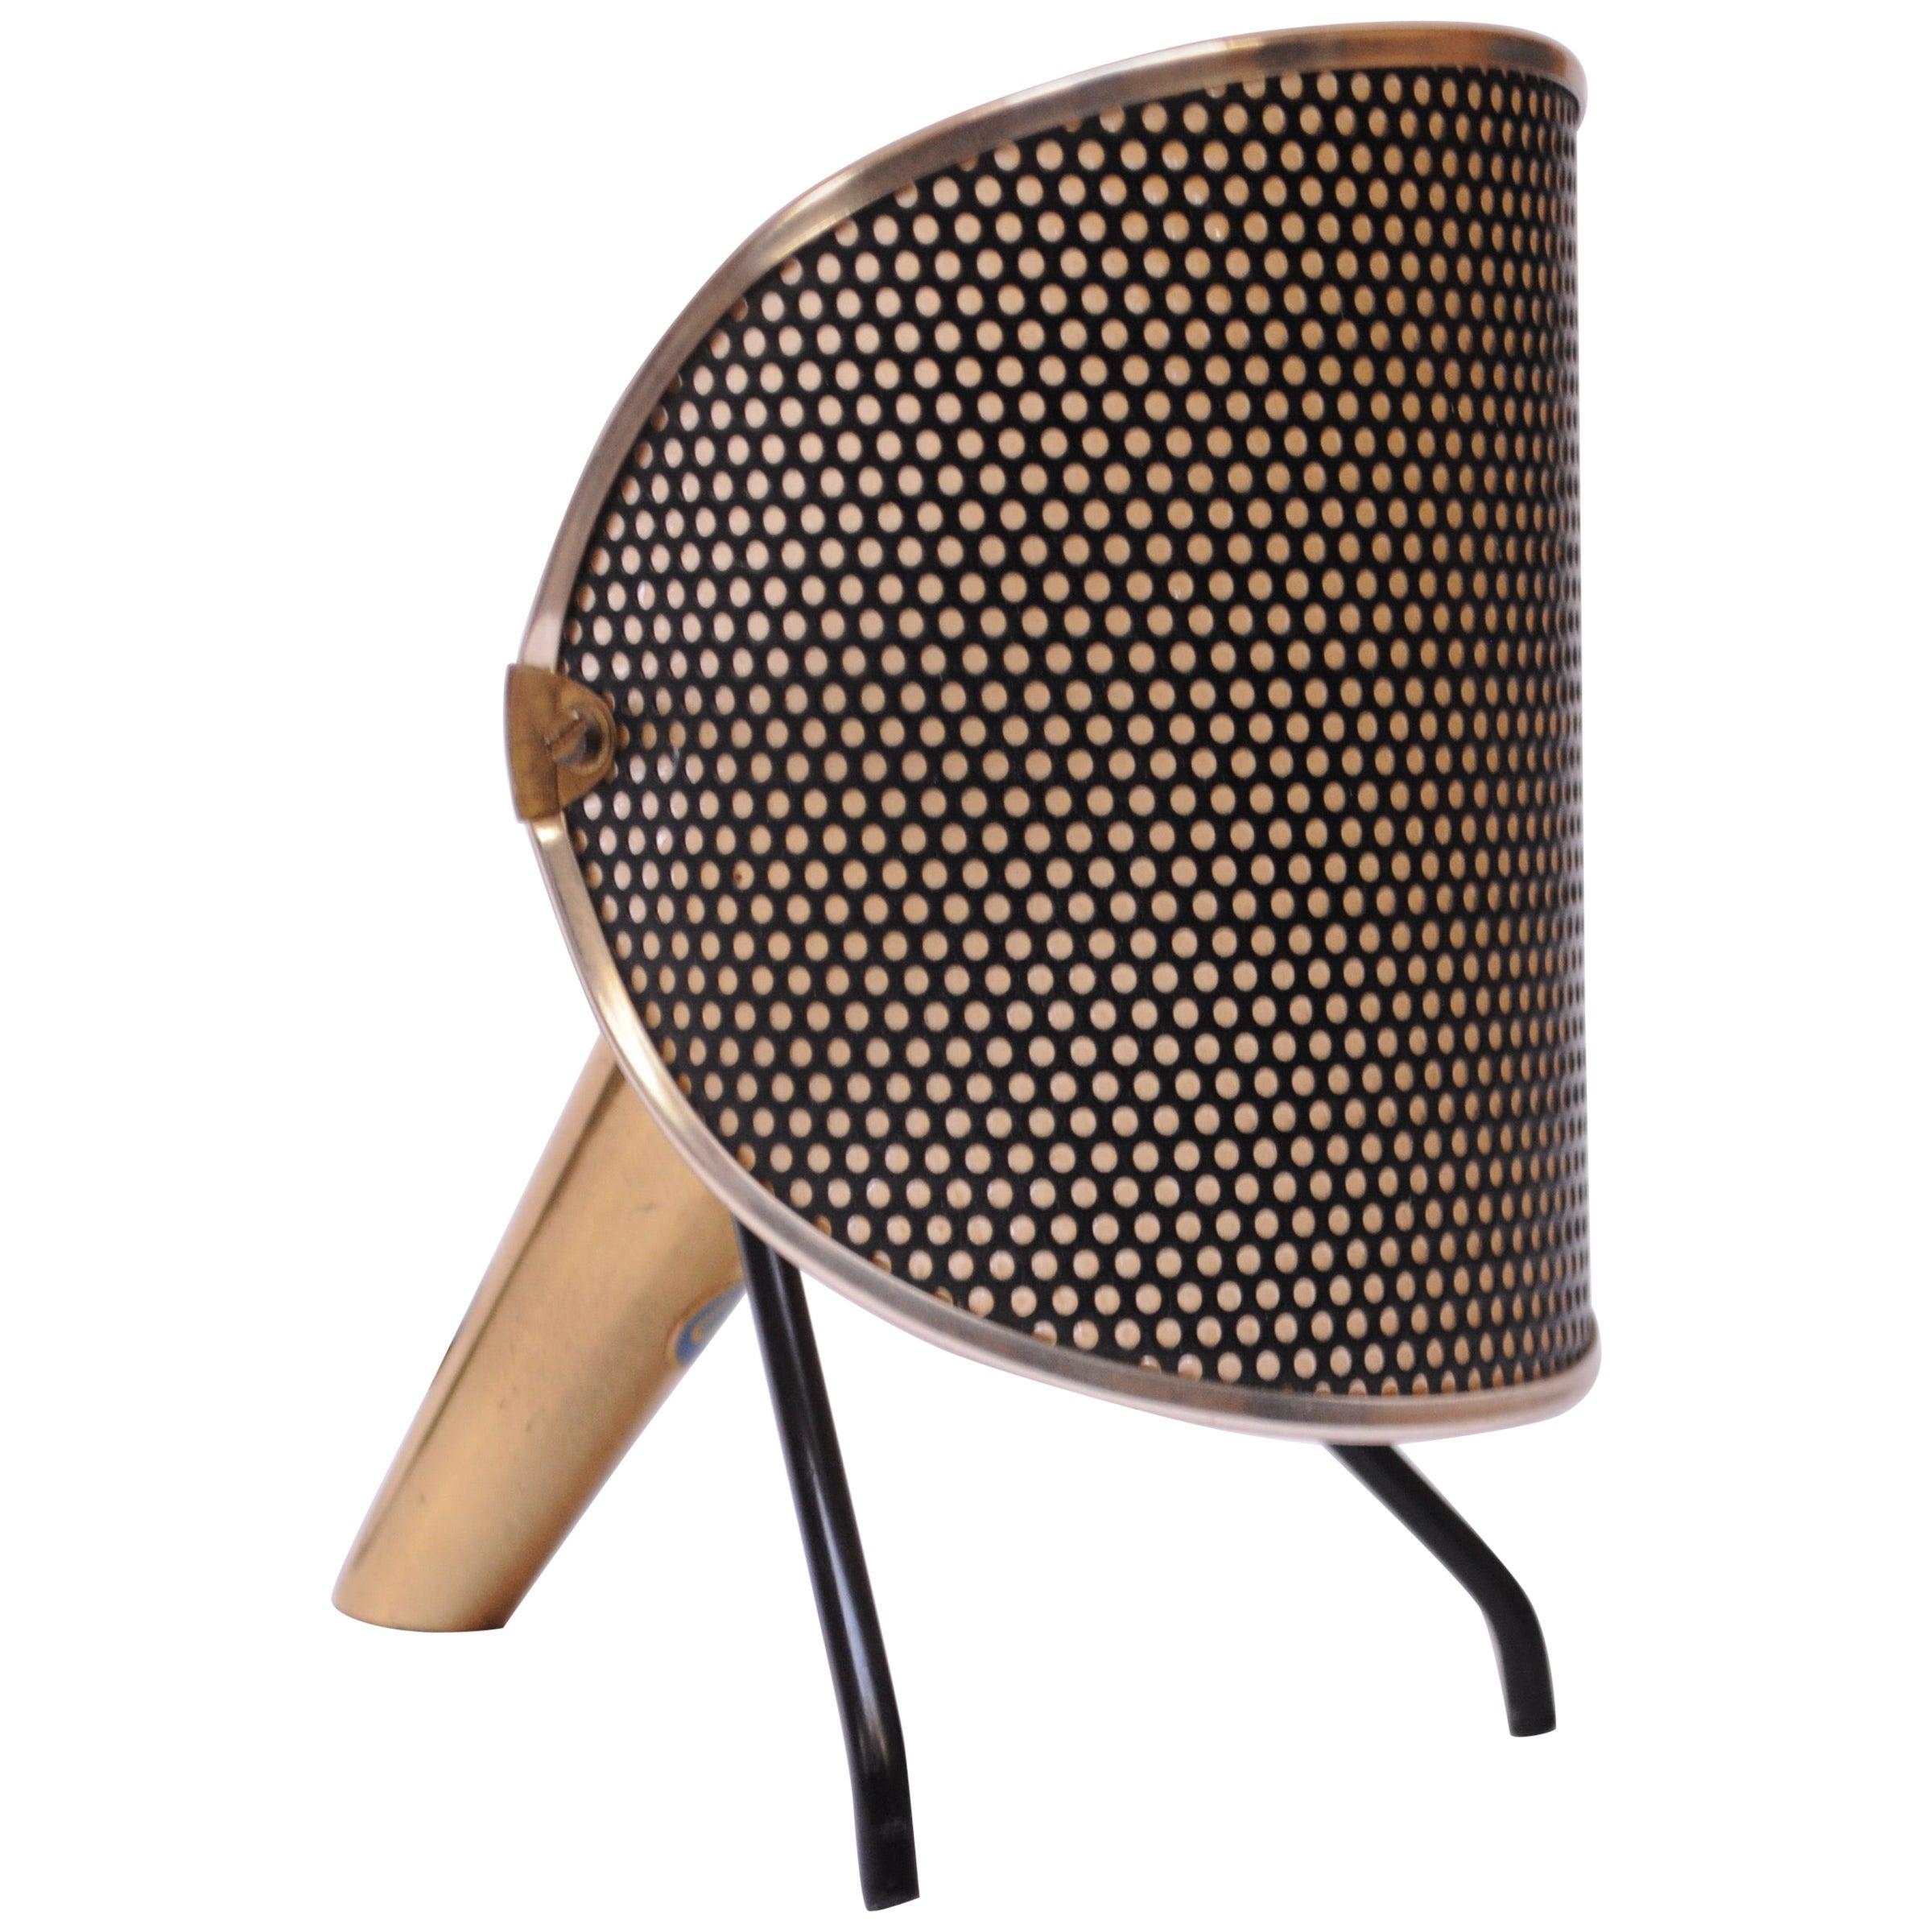 Petite Swedish Table Lamp / Sconce by Ernst Igl for Falkenberg in Brass